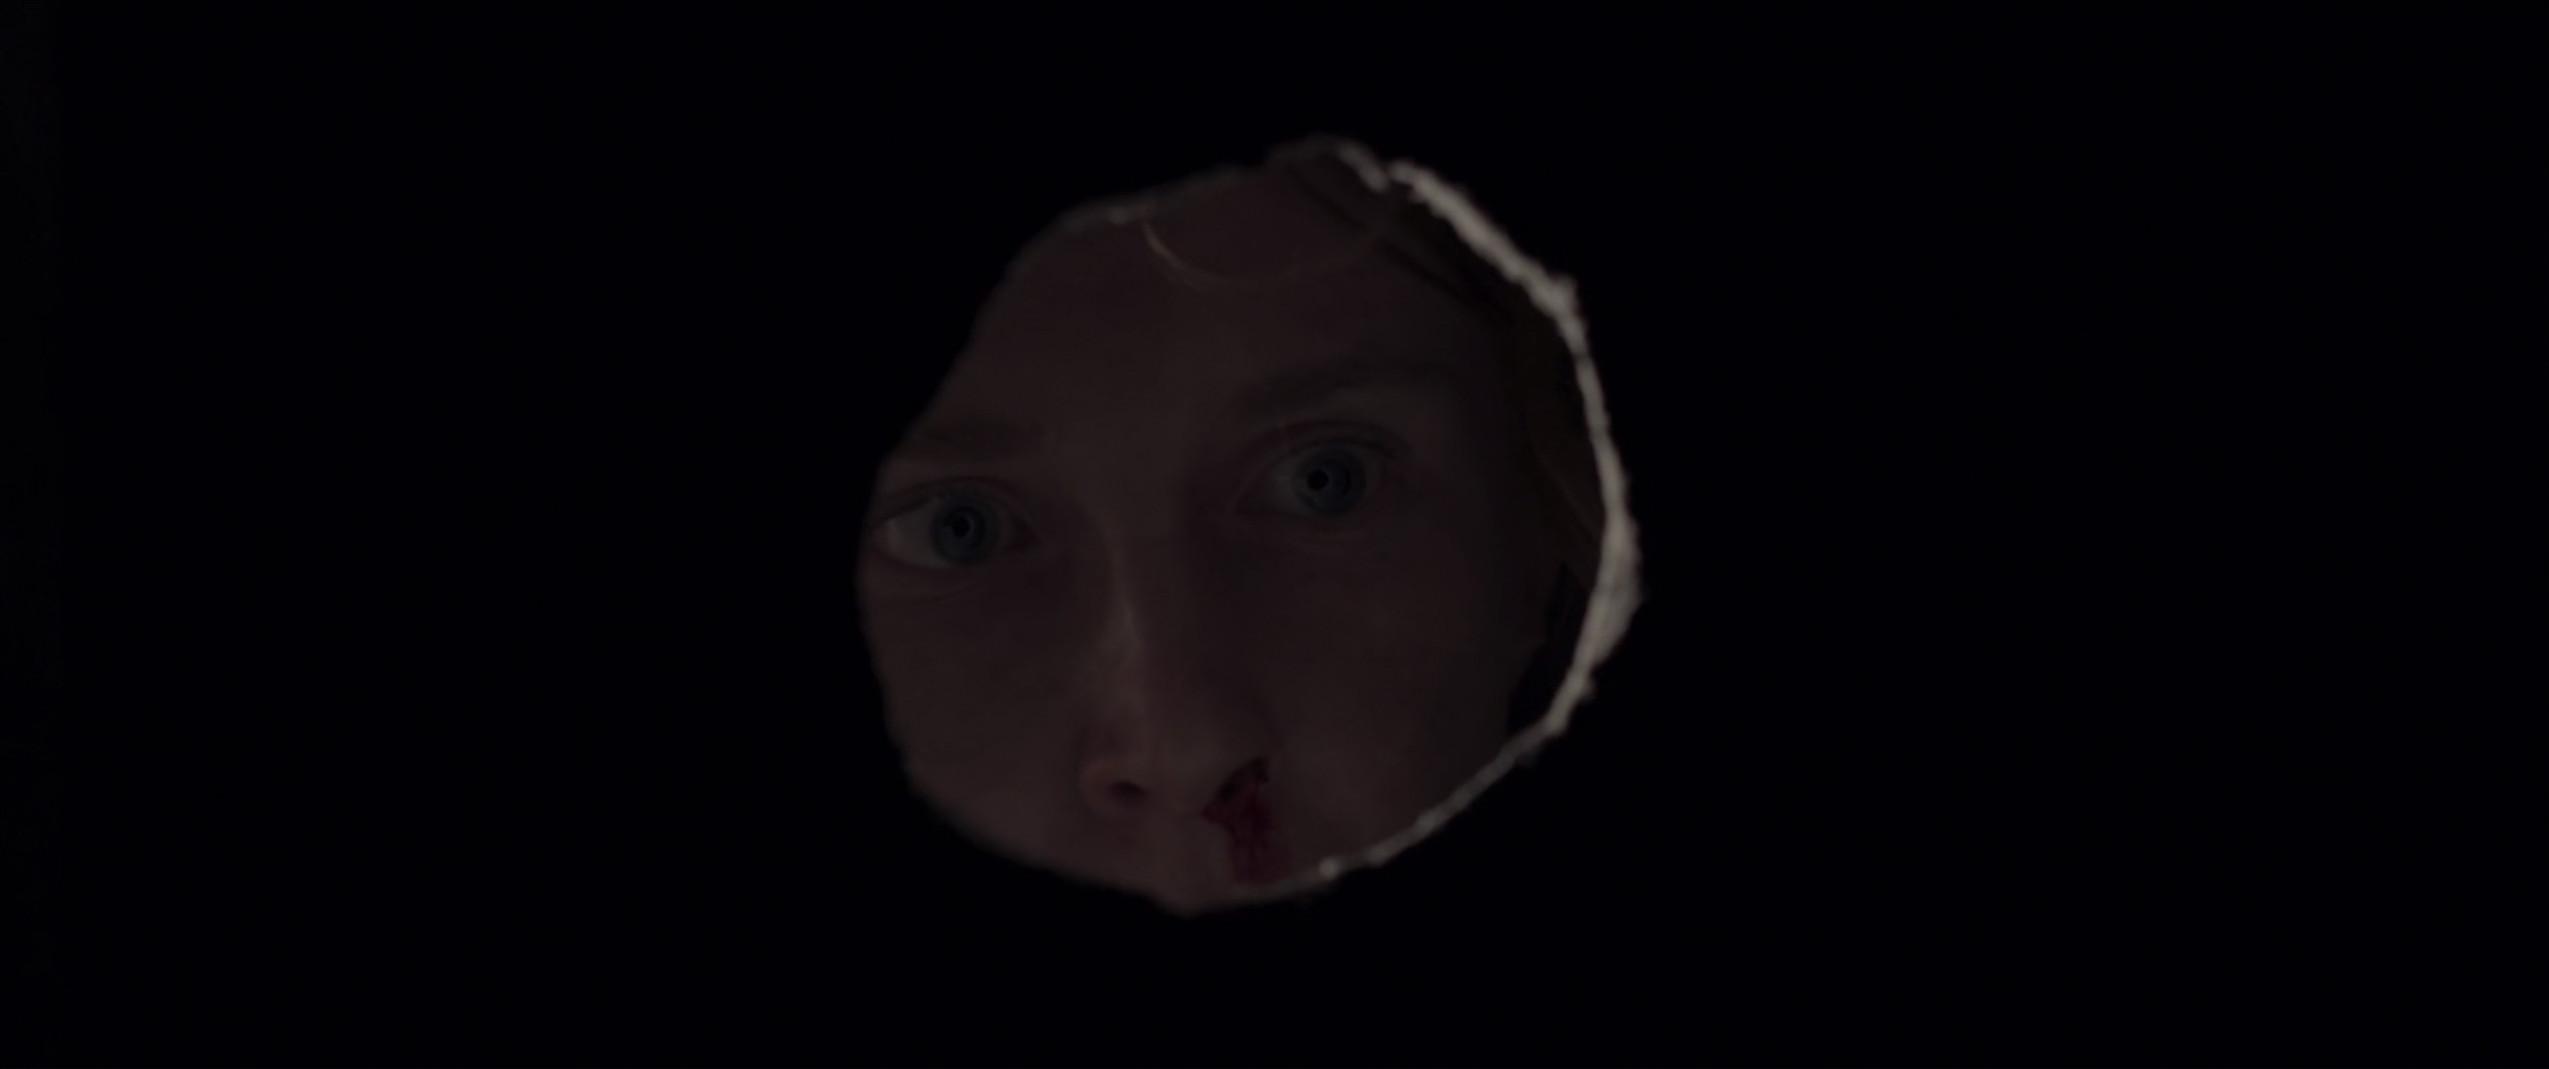 Olga look through hole.jpg